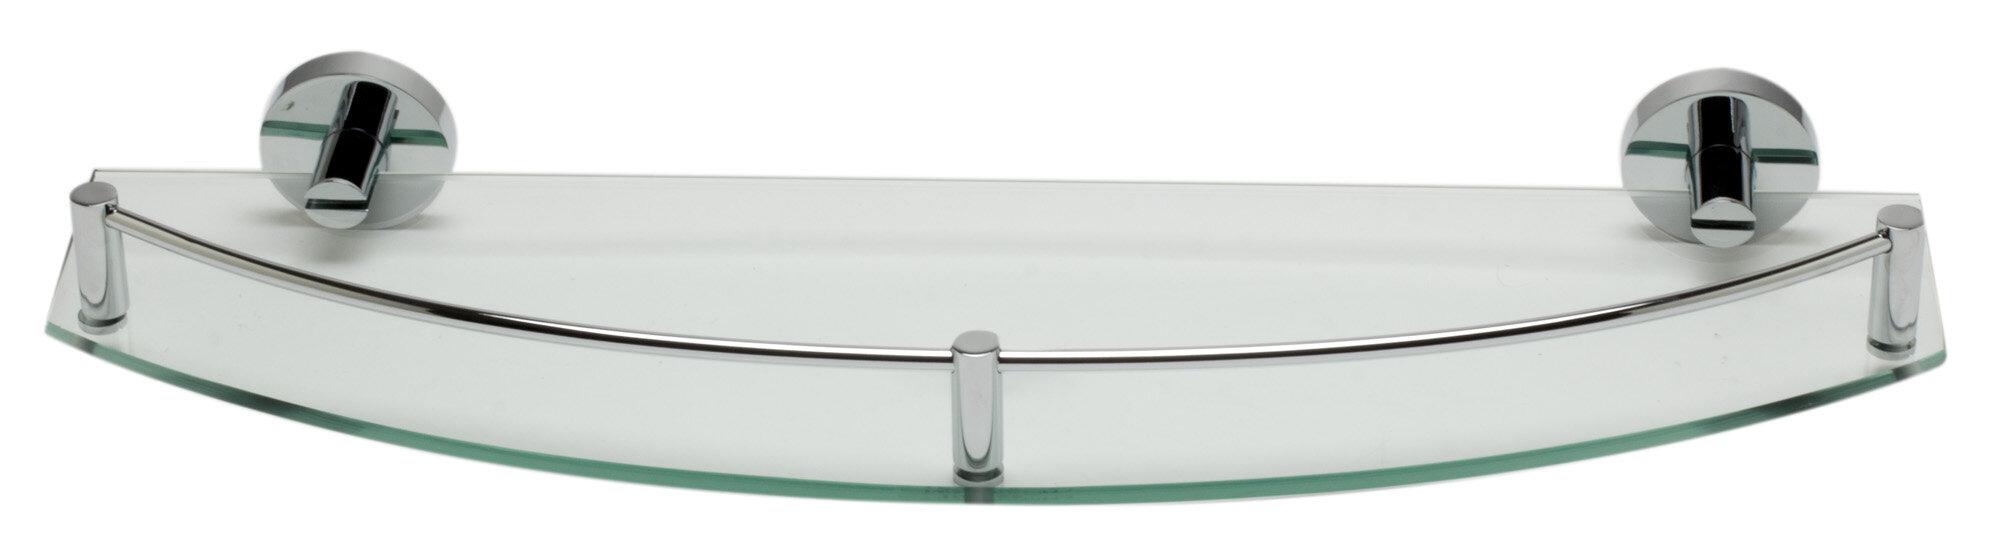 Alfi Brand ALFI brand AB9547 Polished Chrome Wall Mounted Glass ...